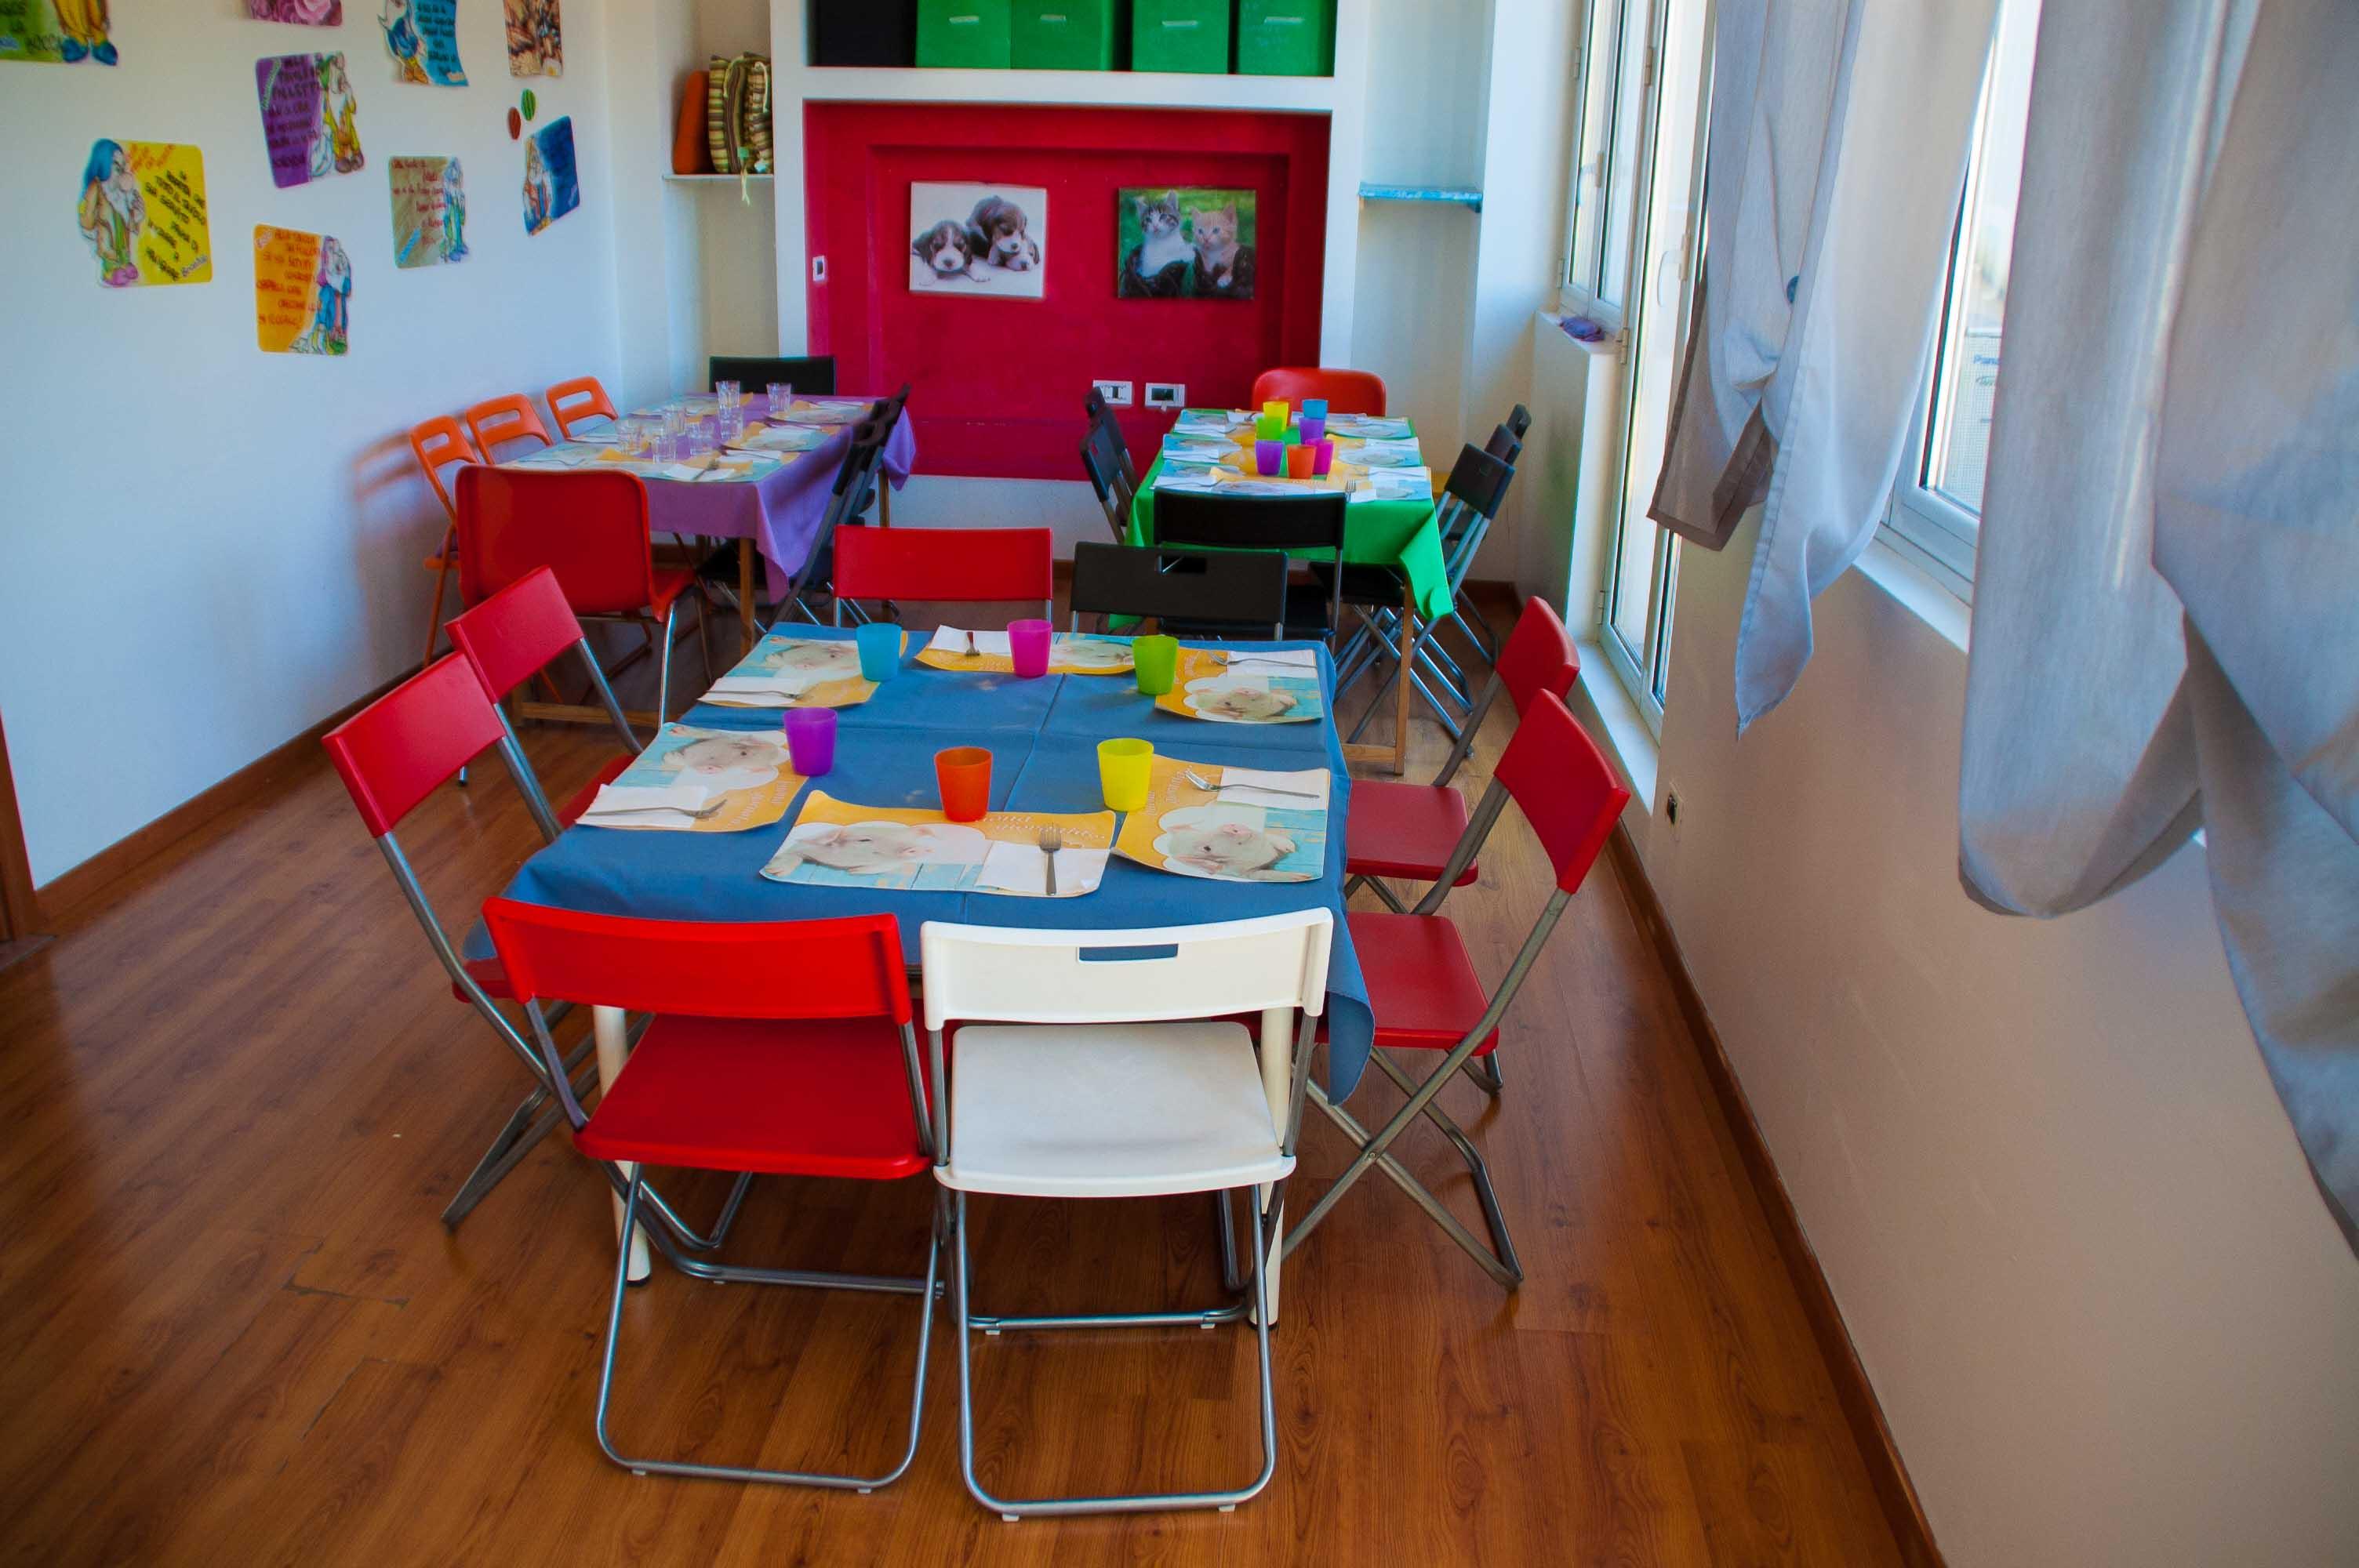 Asilo nido trieste per bambini da 0 a 3 anni da luned a sabato - Stanze da pranzo ...